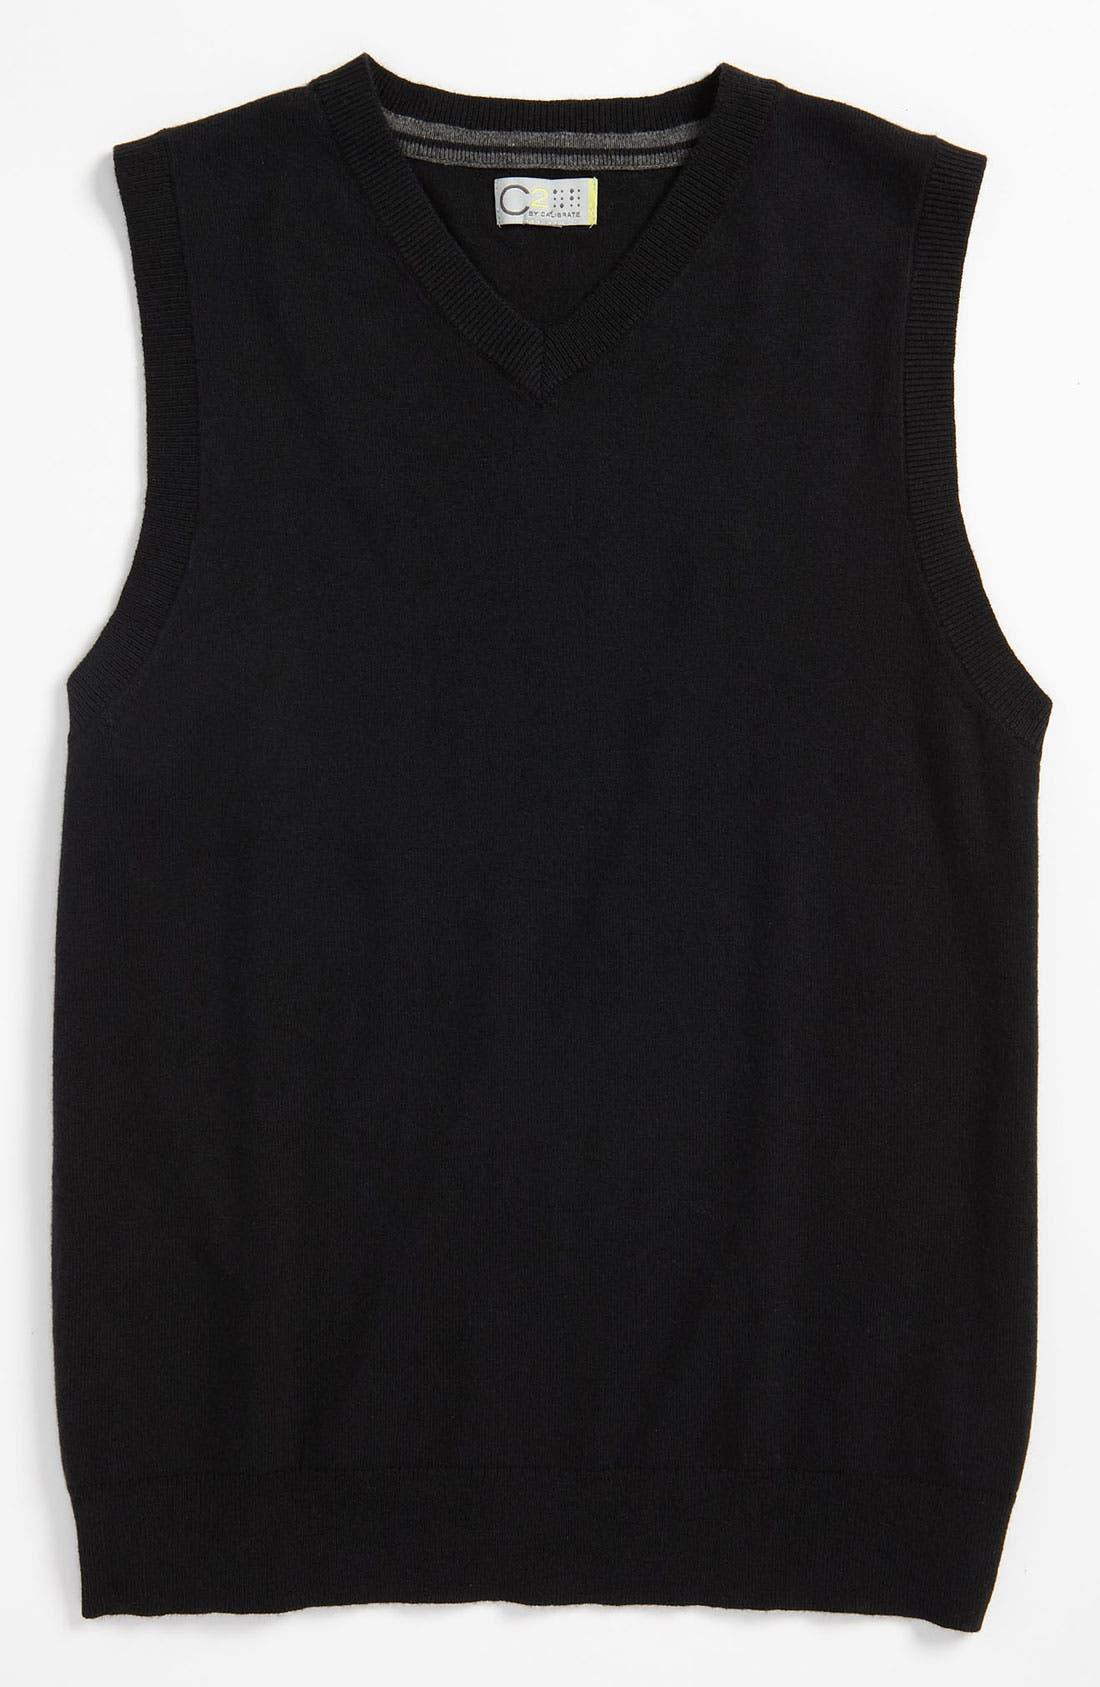 Alternate Image 1 Selected - C2 by Calibrate 'Eli' Sweater Vest (Big Boys)